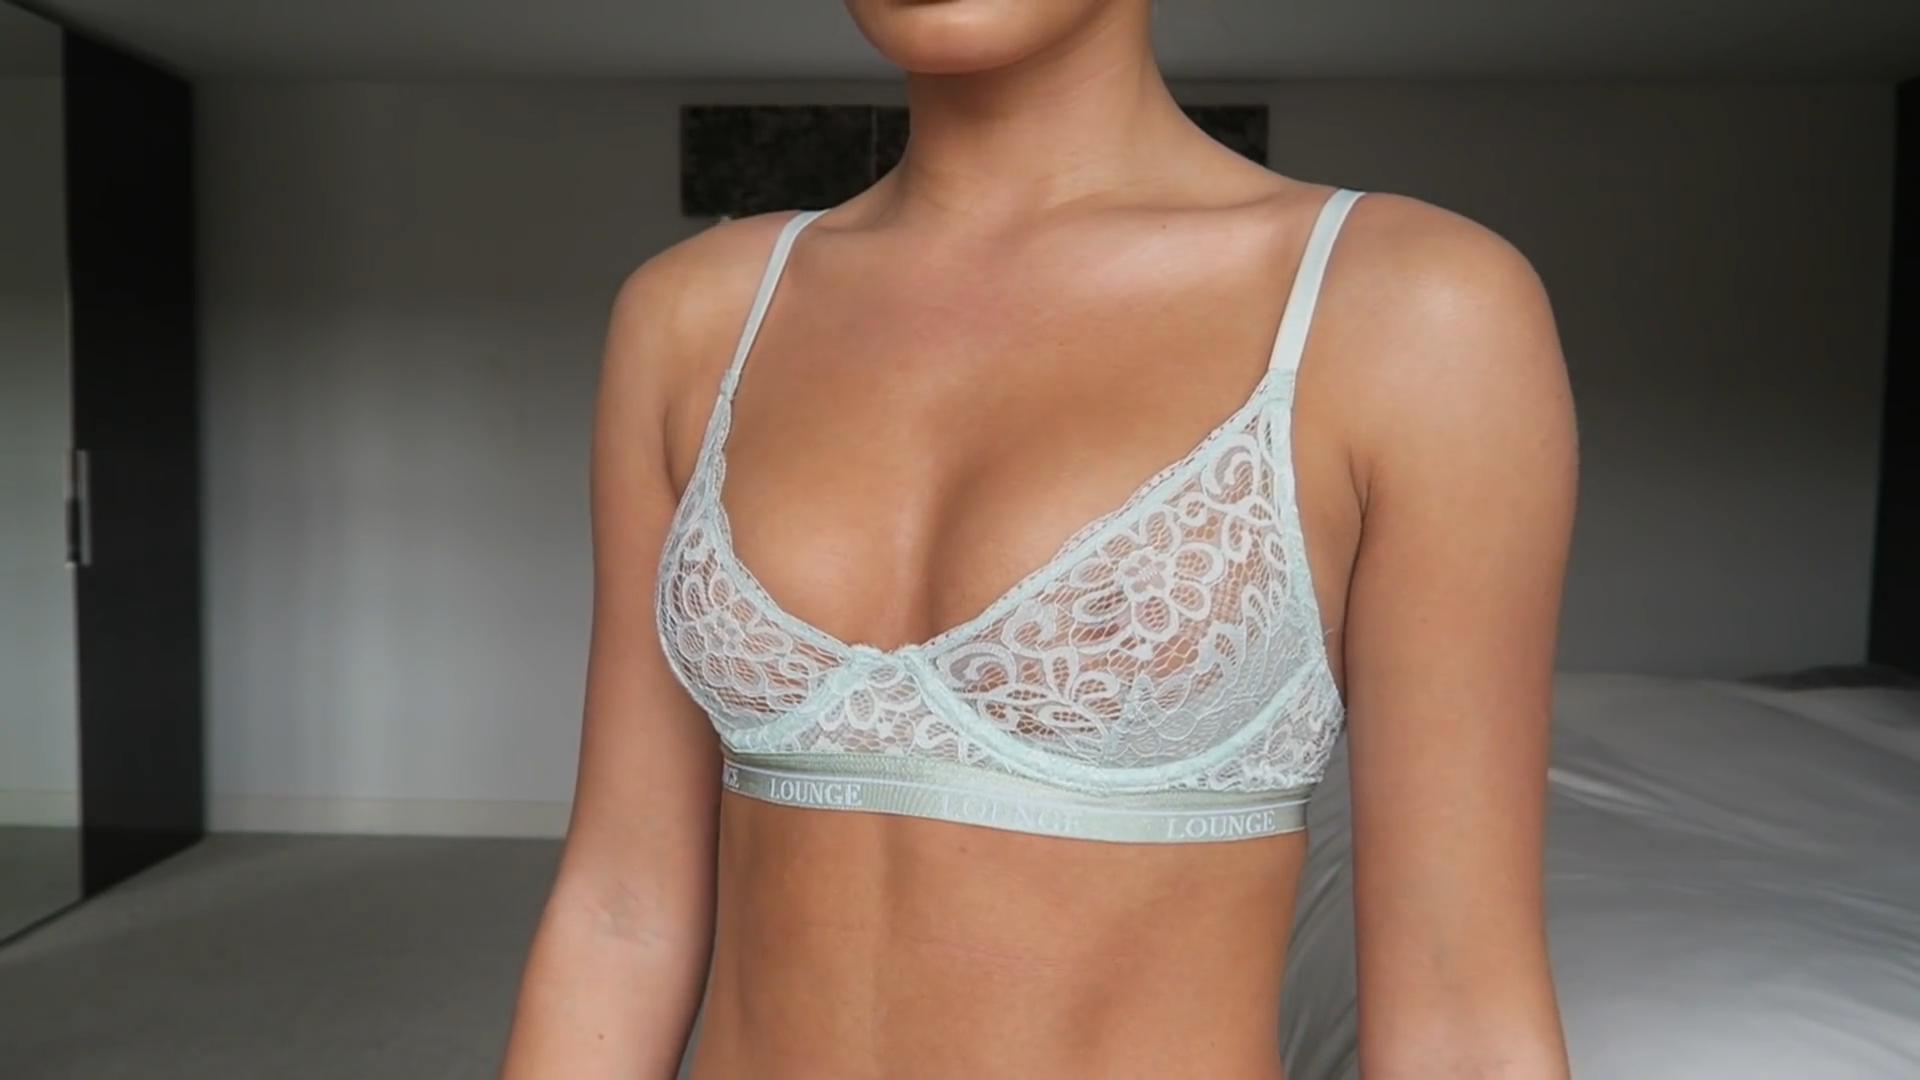 bethan-sowerby-underwear